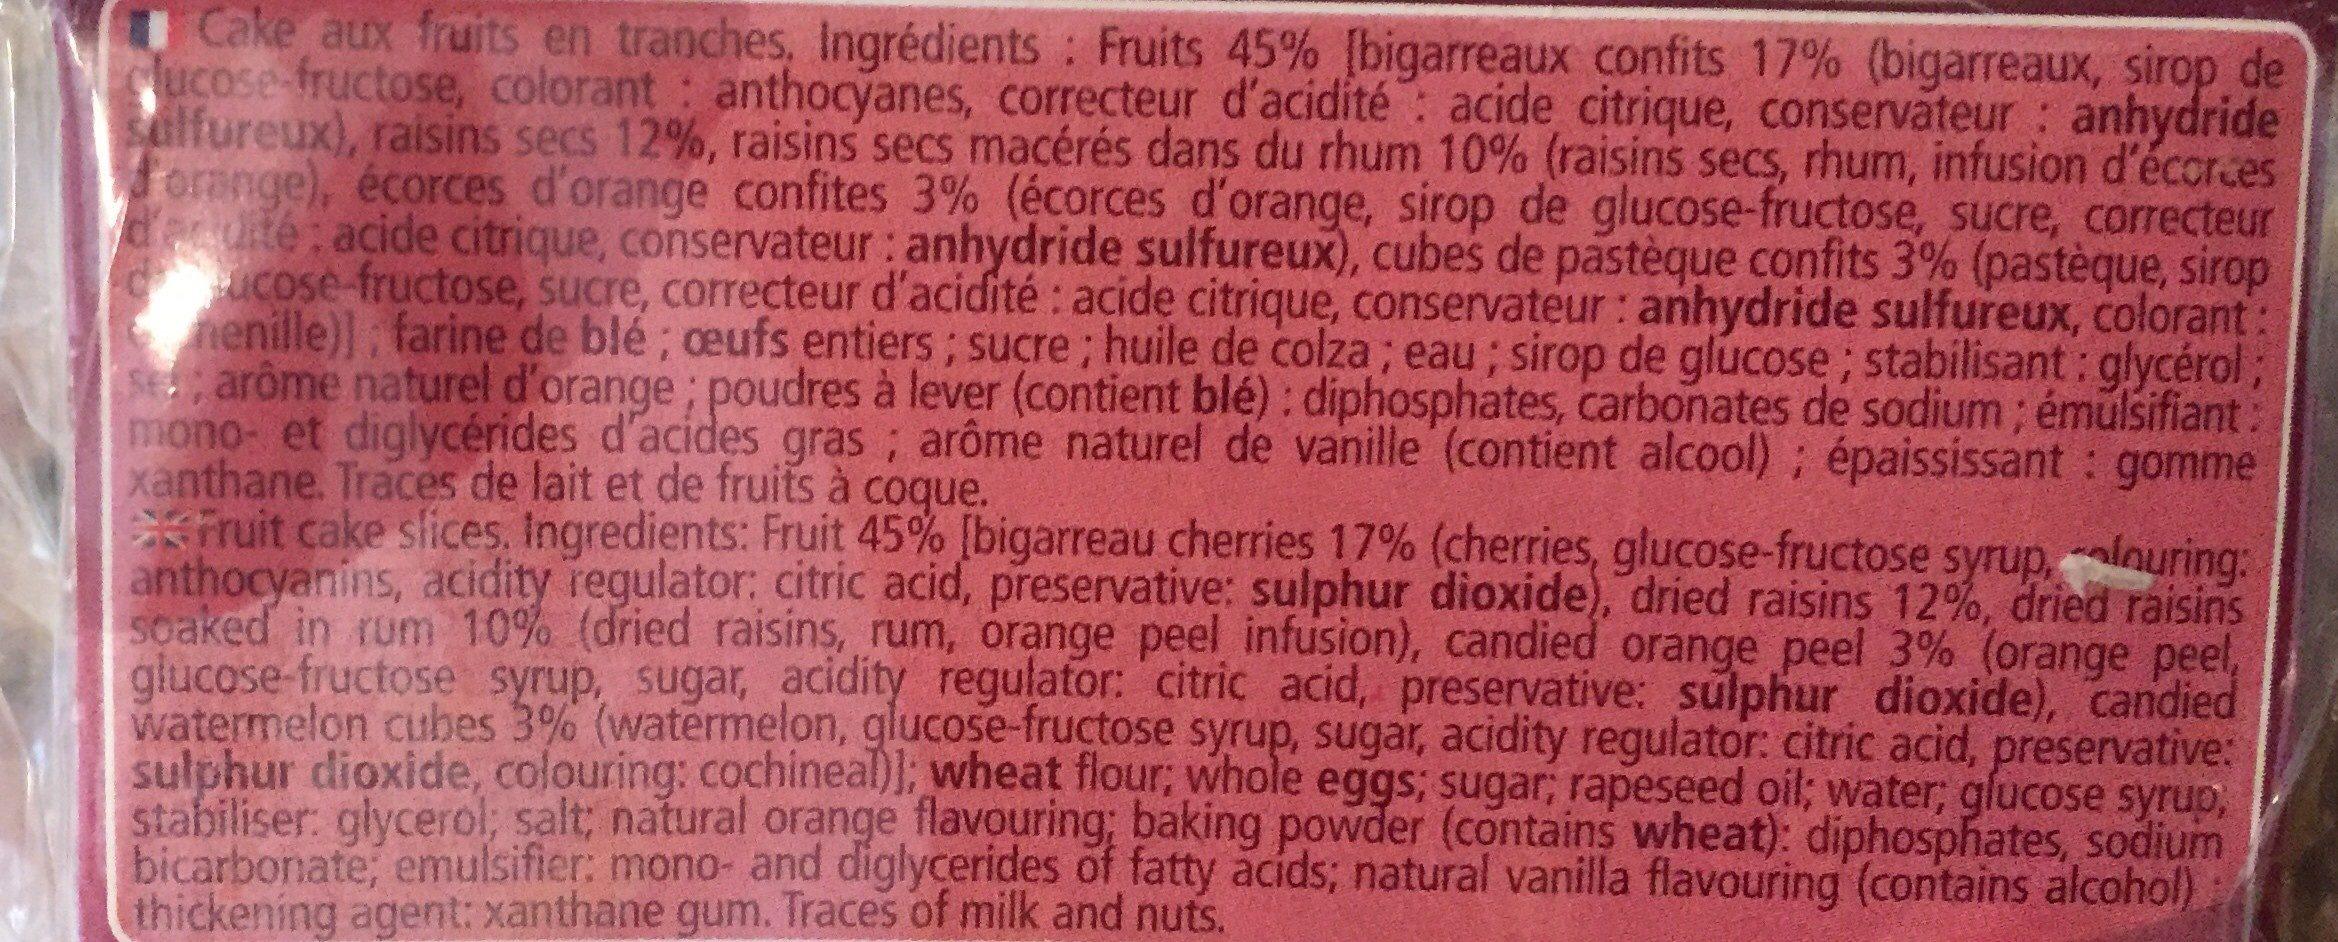 Cake aux fruits en tranches - Ingrediënten - fr